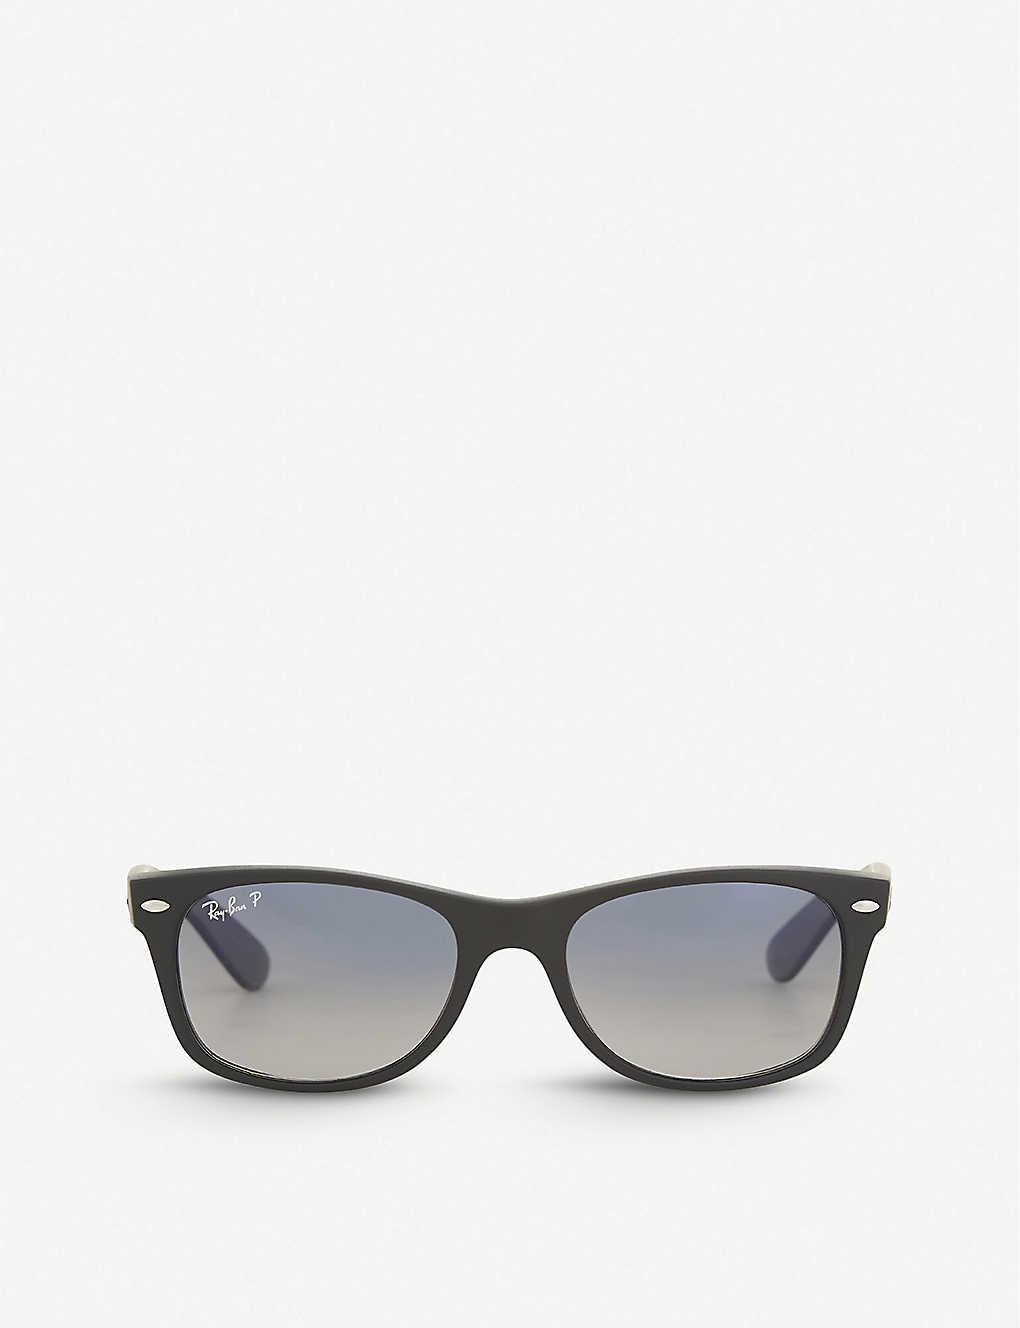 5954629240 RAY-BAN - RB2132 New Wayfarer square-frame sunglasses